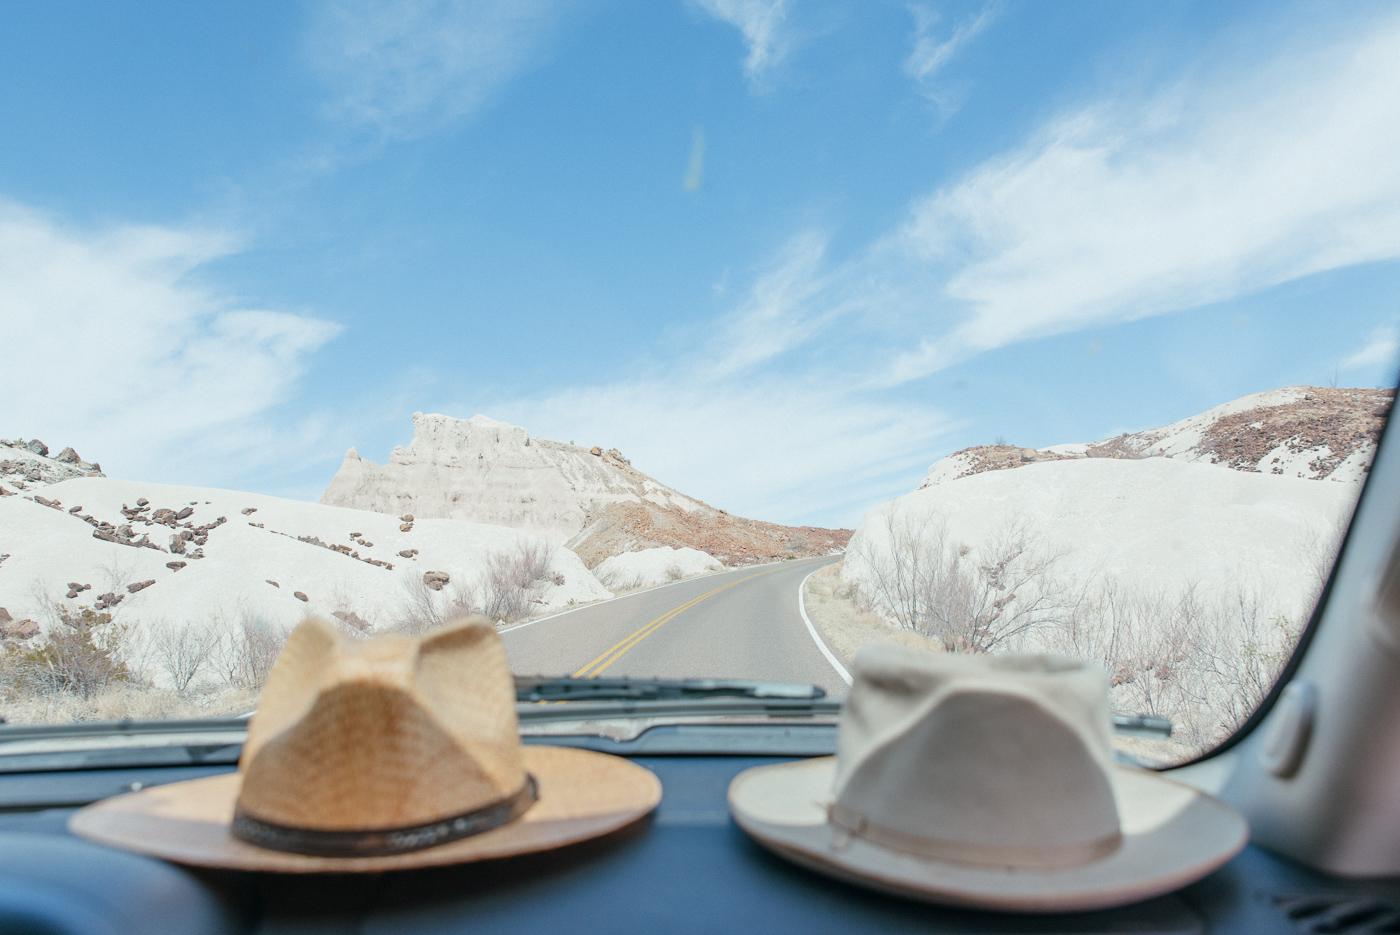 big bend national park texas camping road trip america yall  (23 of 46).jpg